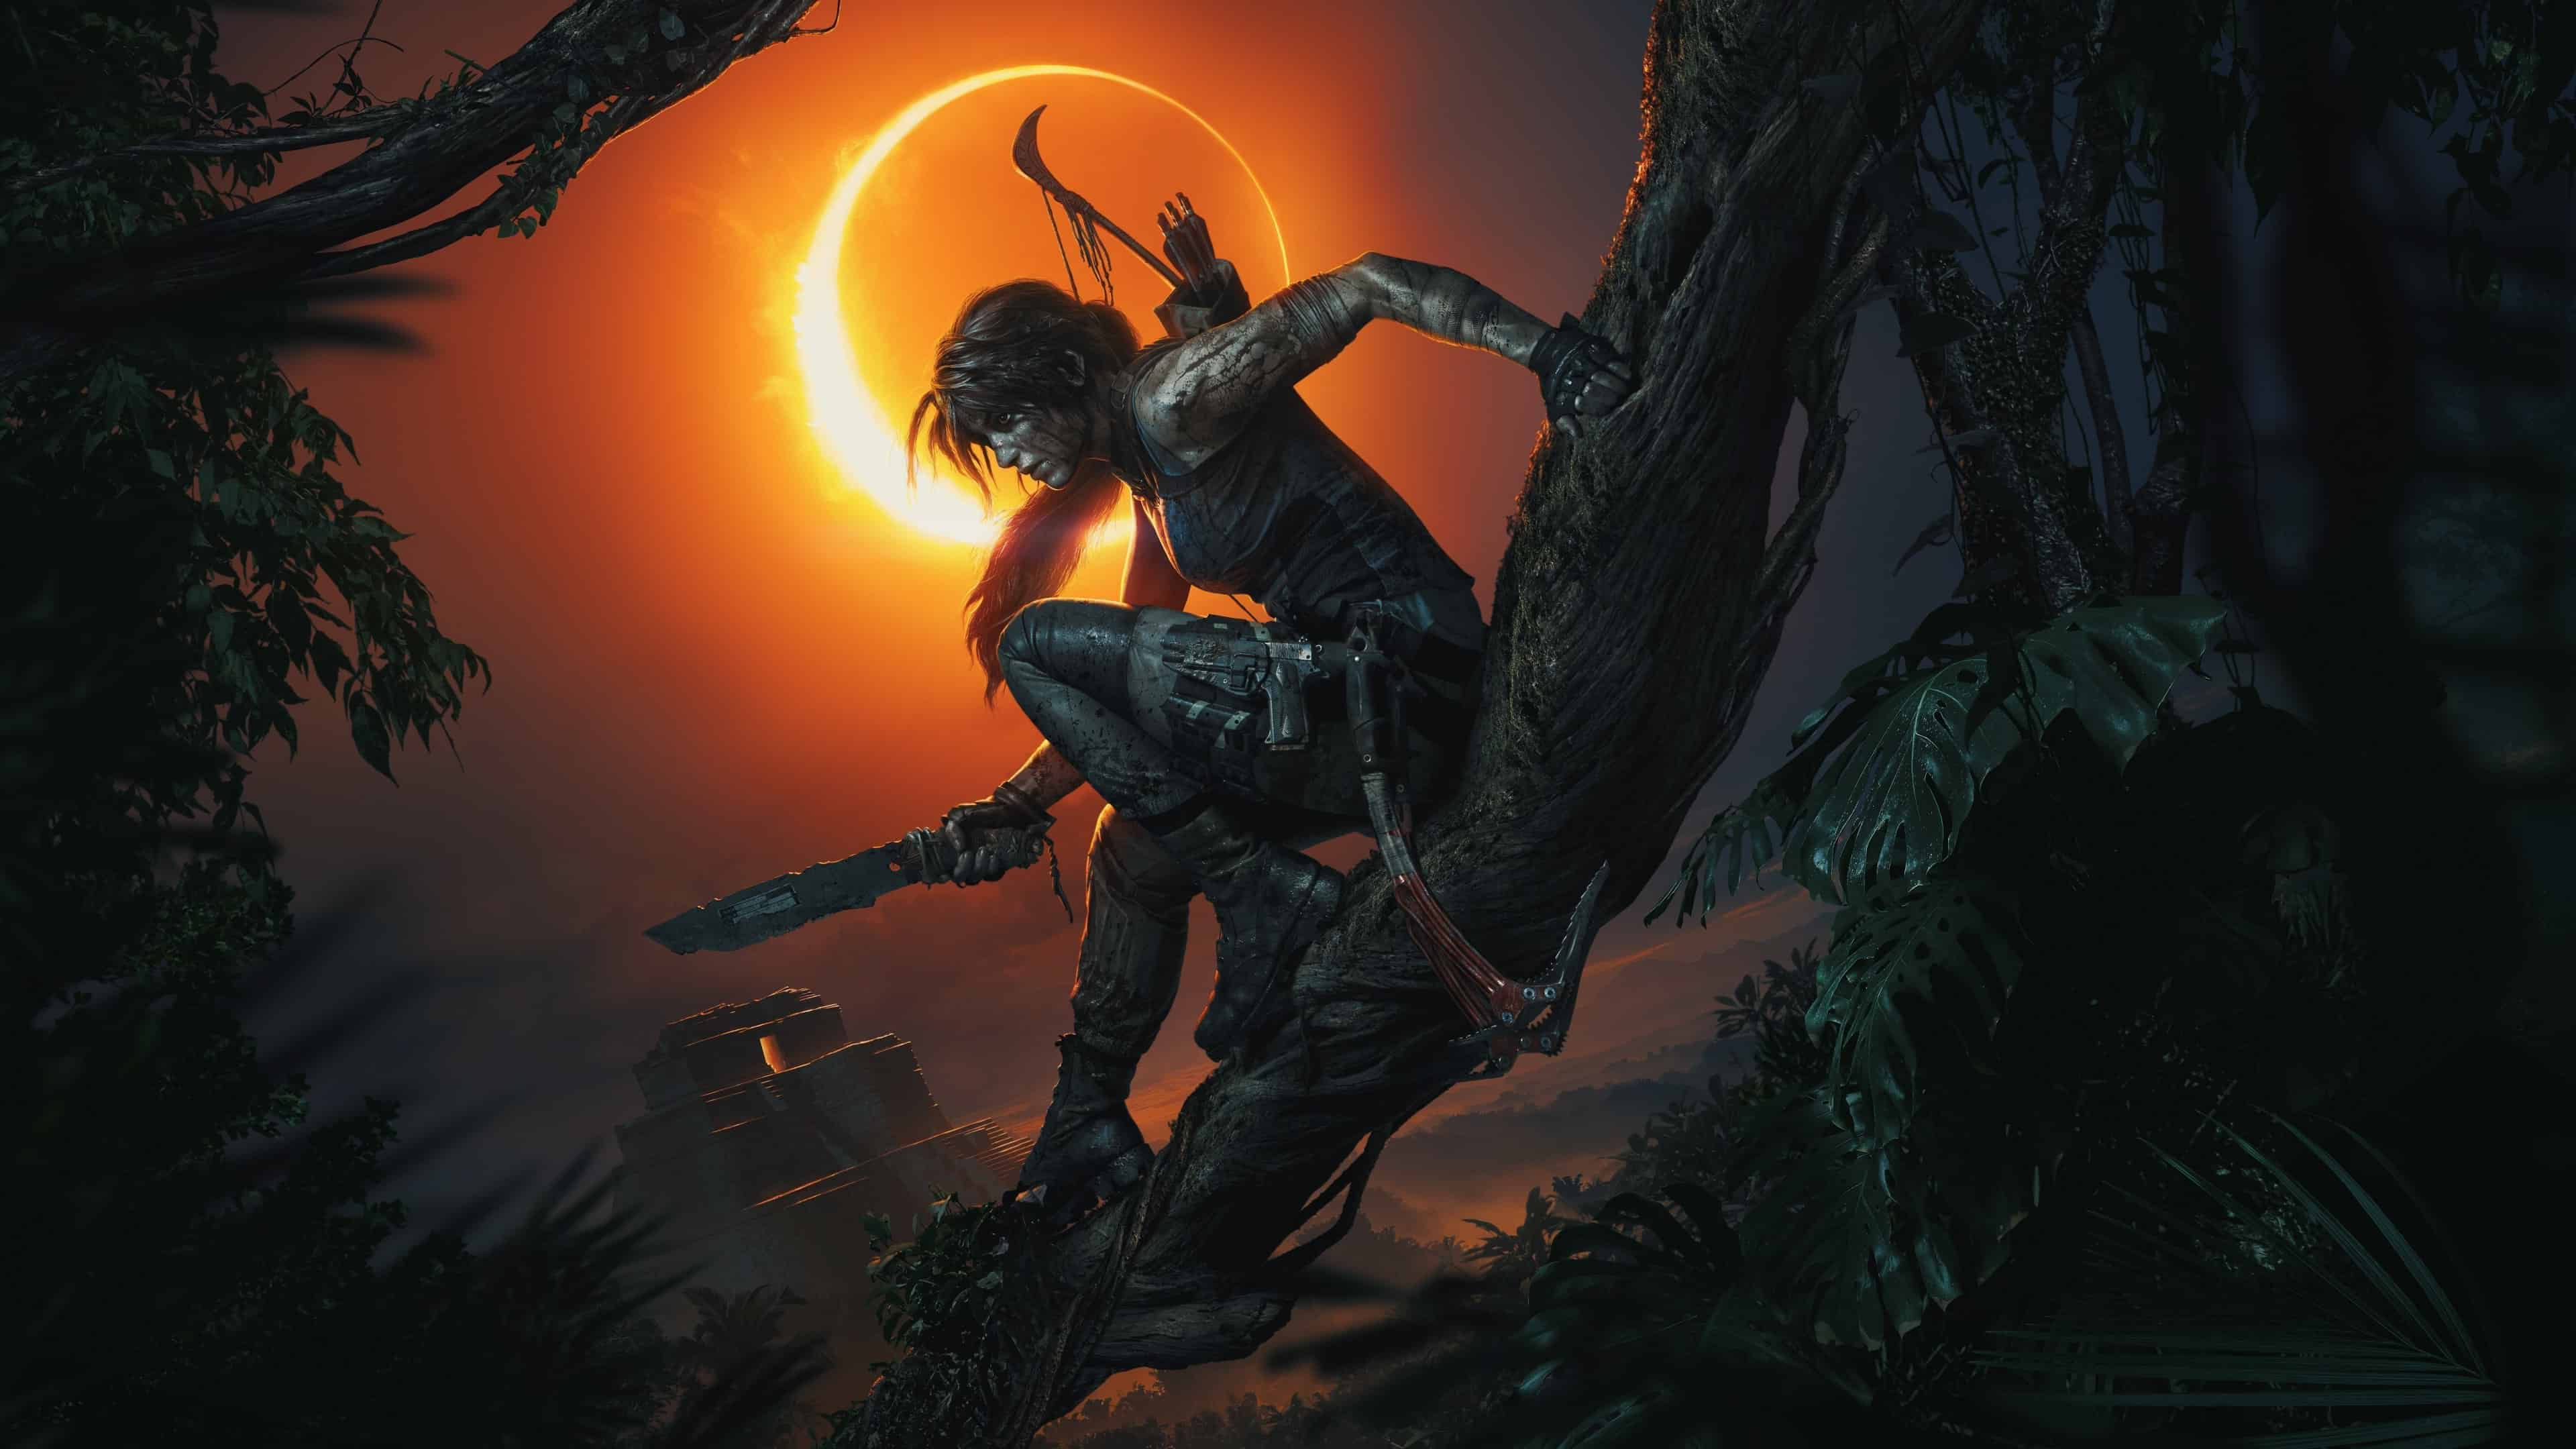 Shadow Of The Tomb Raider Lara Croft E3 Uhd 4k Wallpaper Pixelz